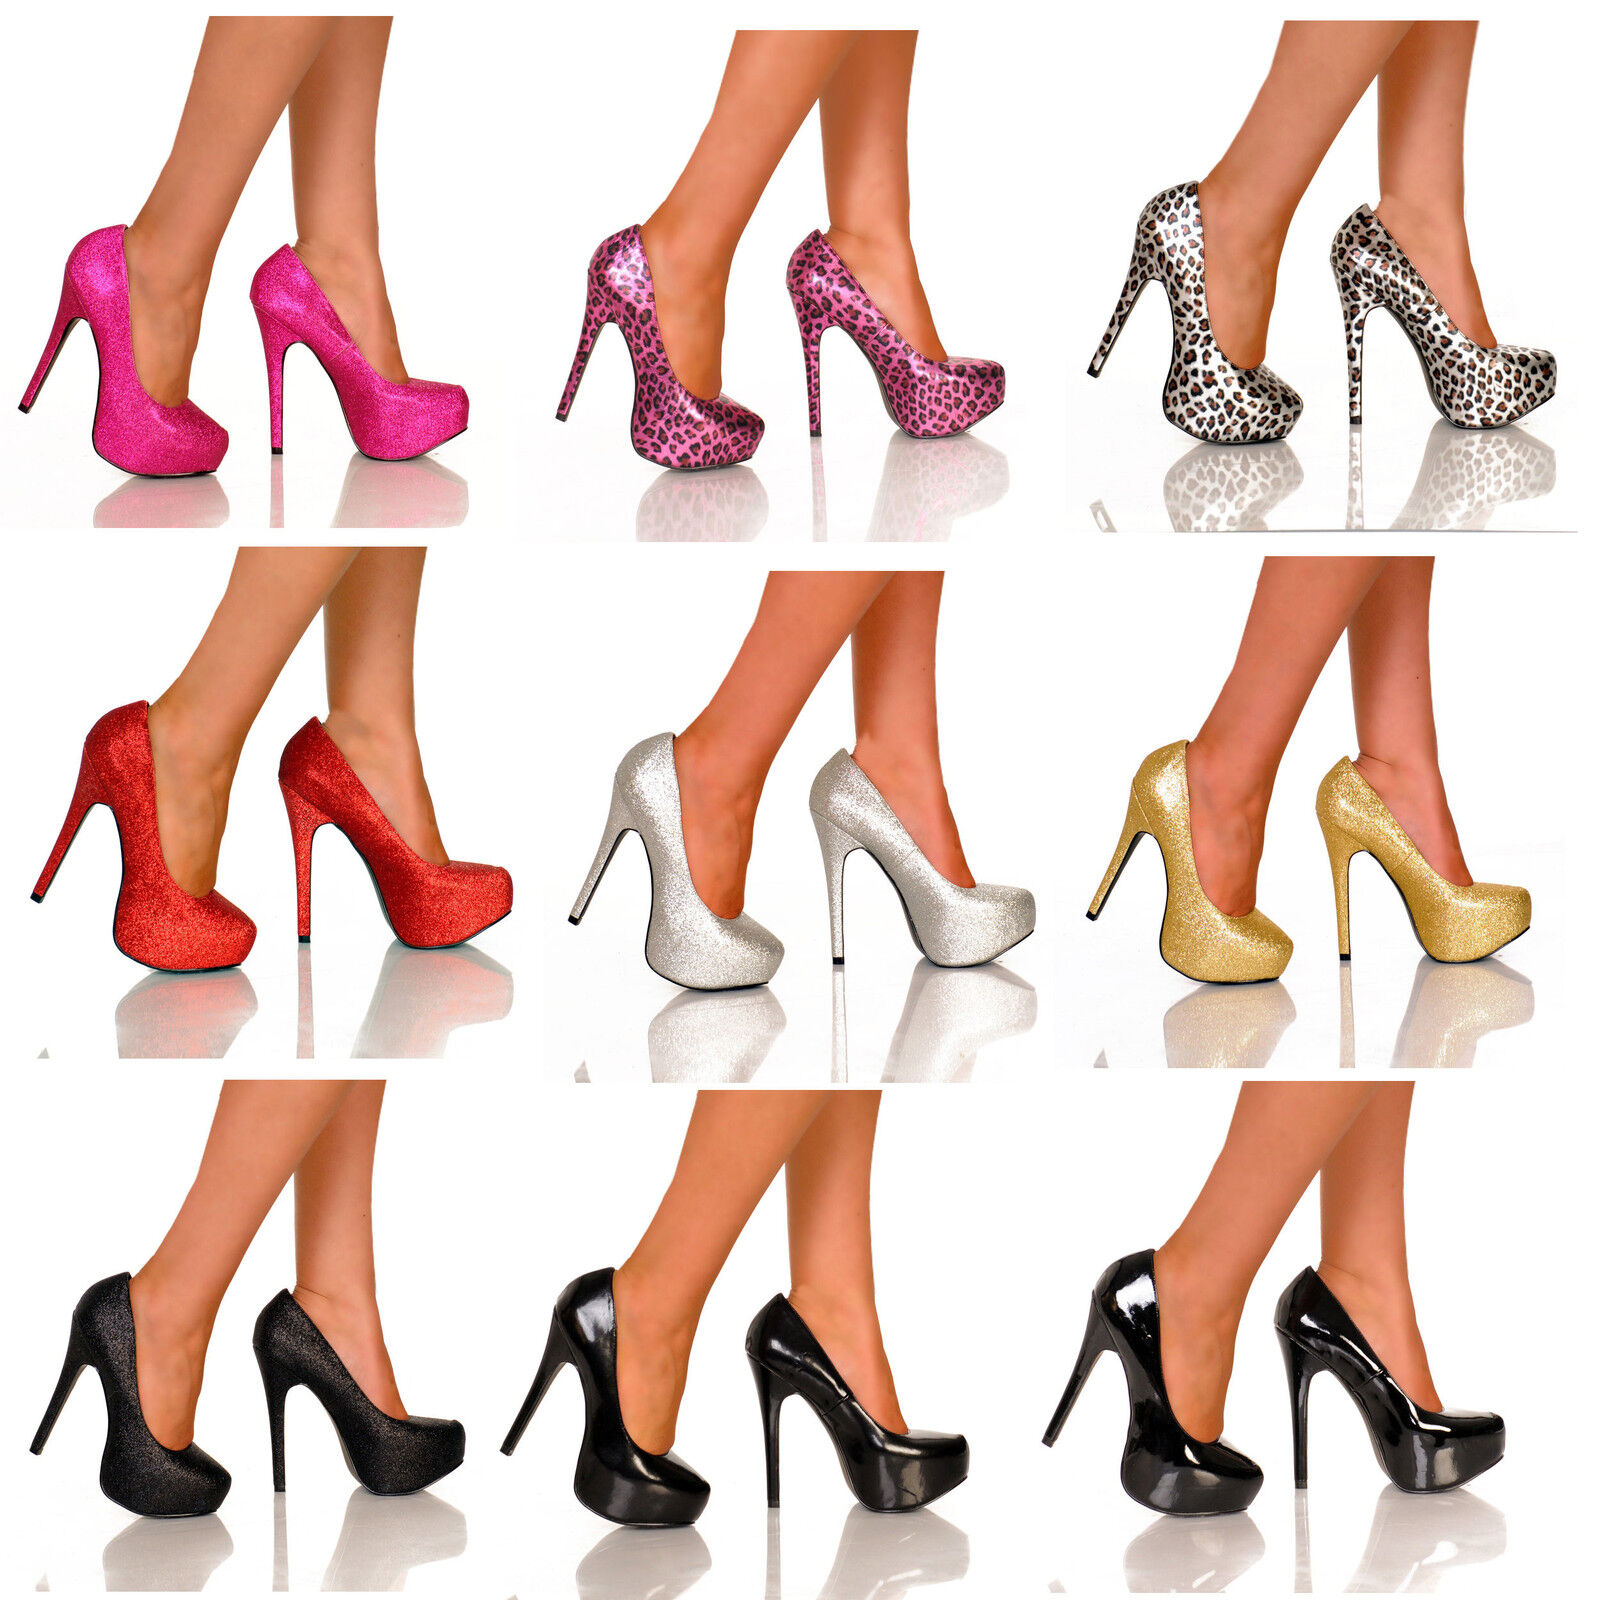 The Highest Heel KISSABLE-11 Sexy 5 1 2  Covered Platform Plain Pump Size 5-13